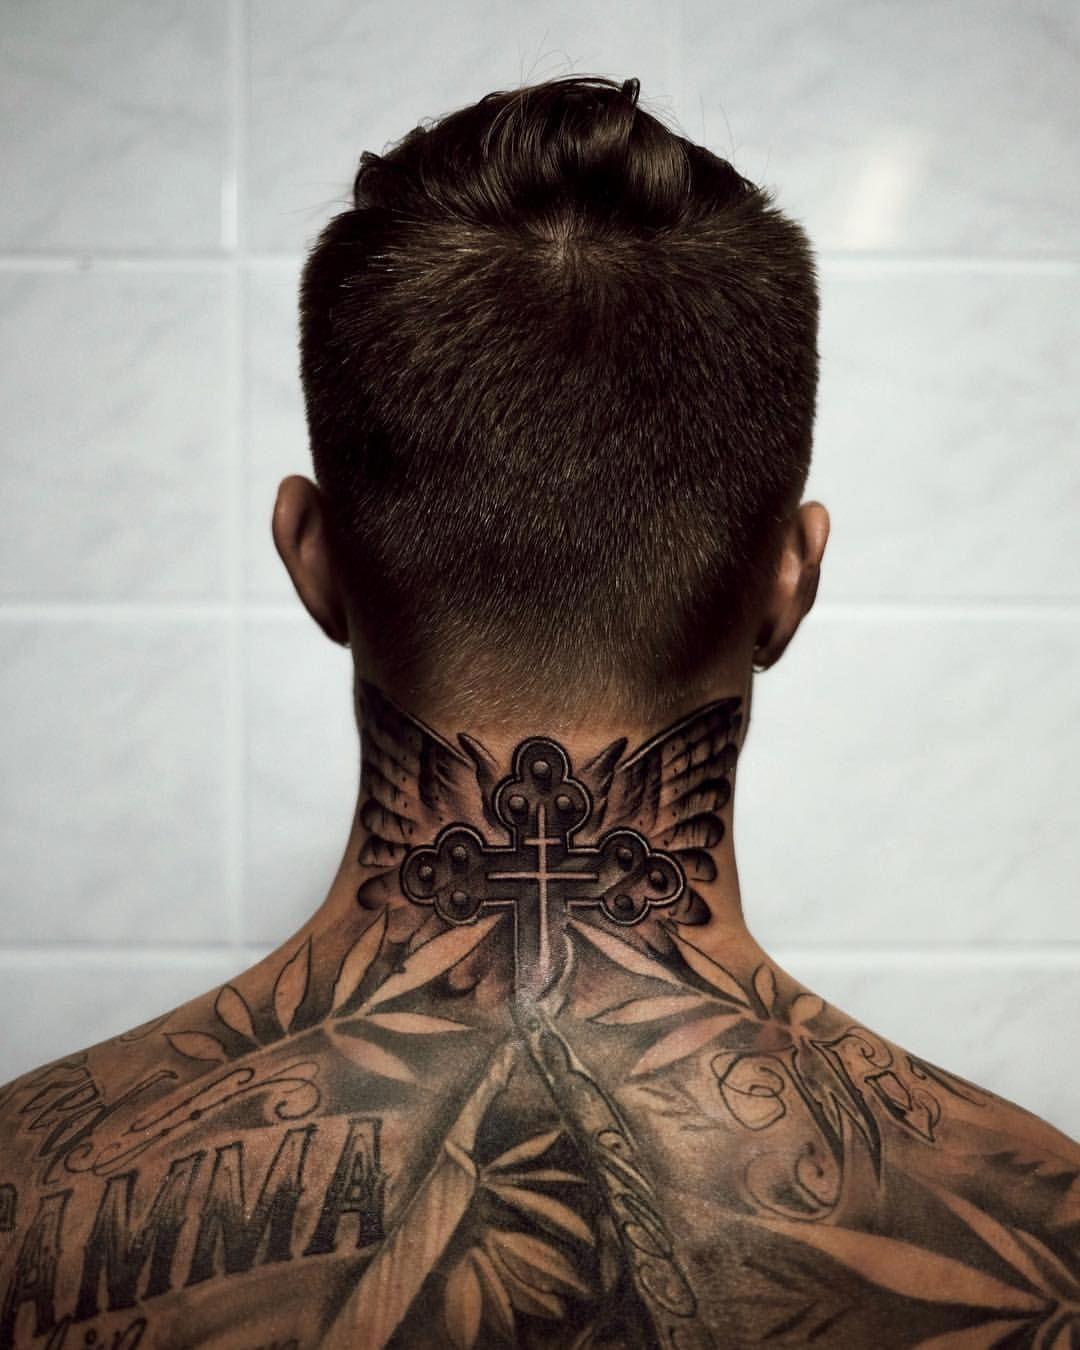 50 4 Mil Me Gusta 361 Comentarios Johnny Edlipd Johnnyedlind En Instagram New Ink By My Back Of Neck Tattoo Men Neck Tattoo For Guys Tattoos For Guys